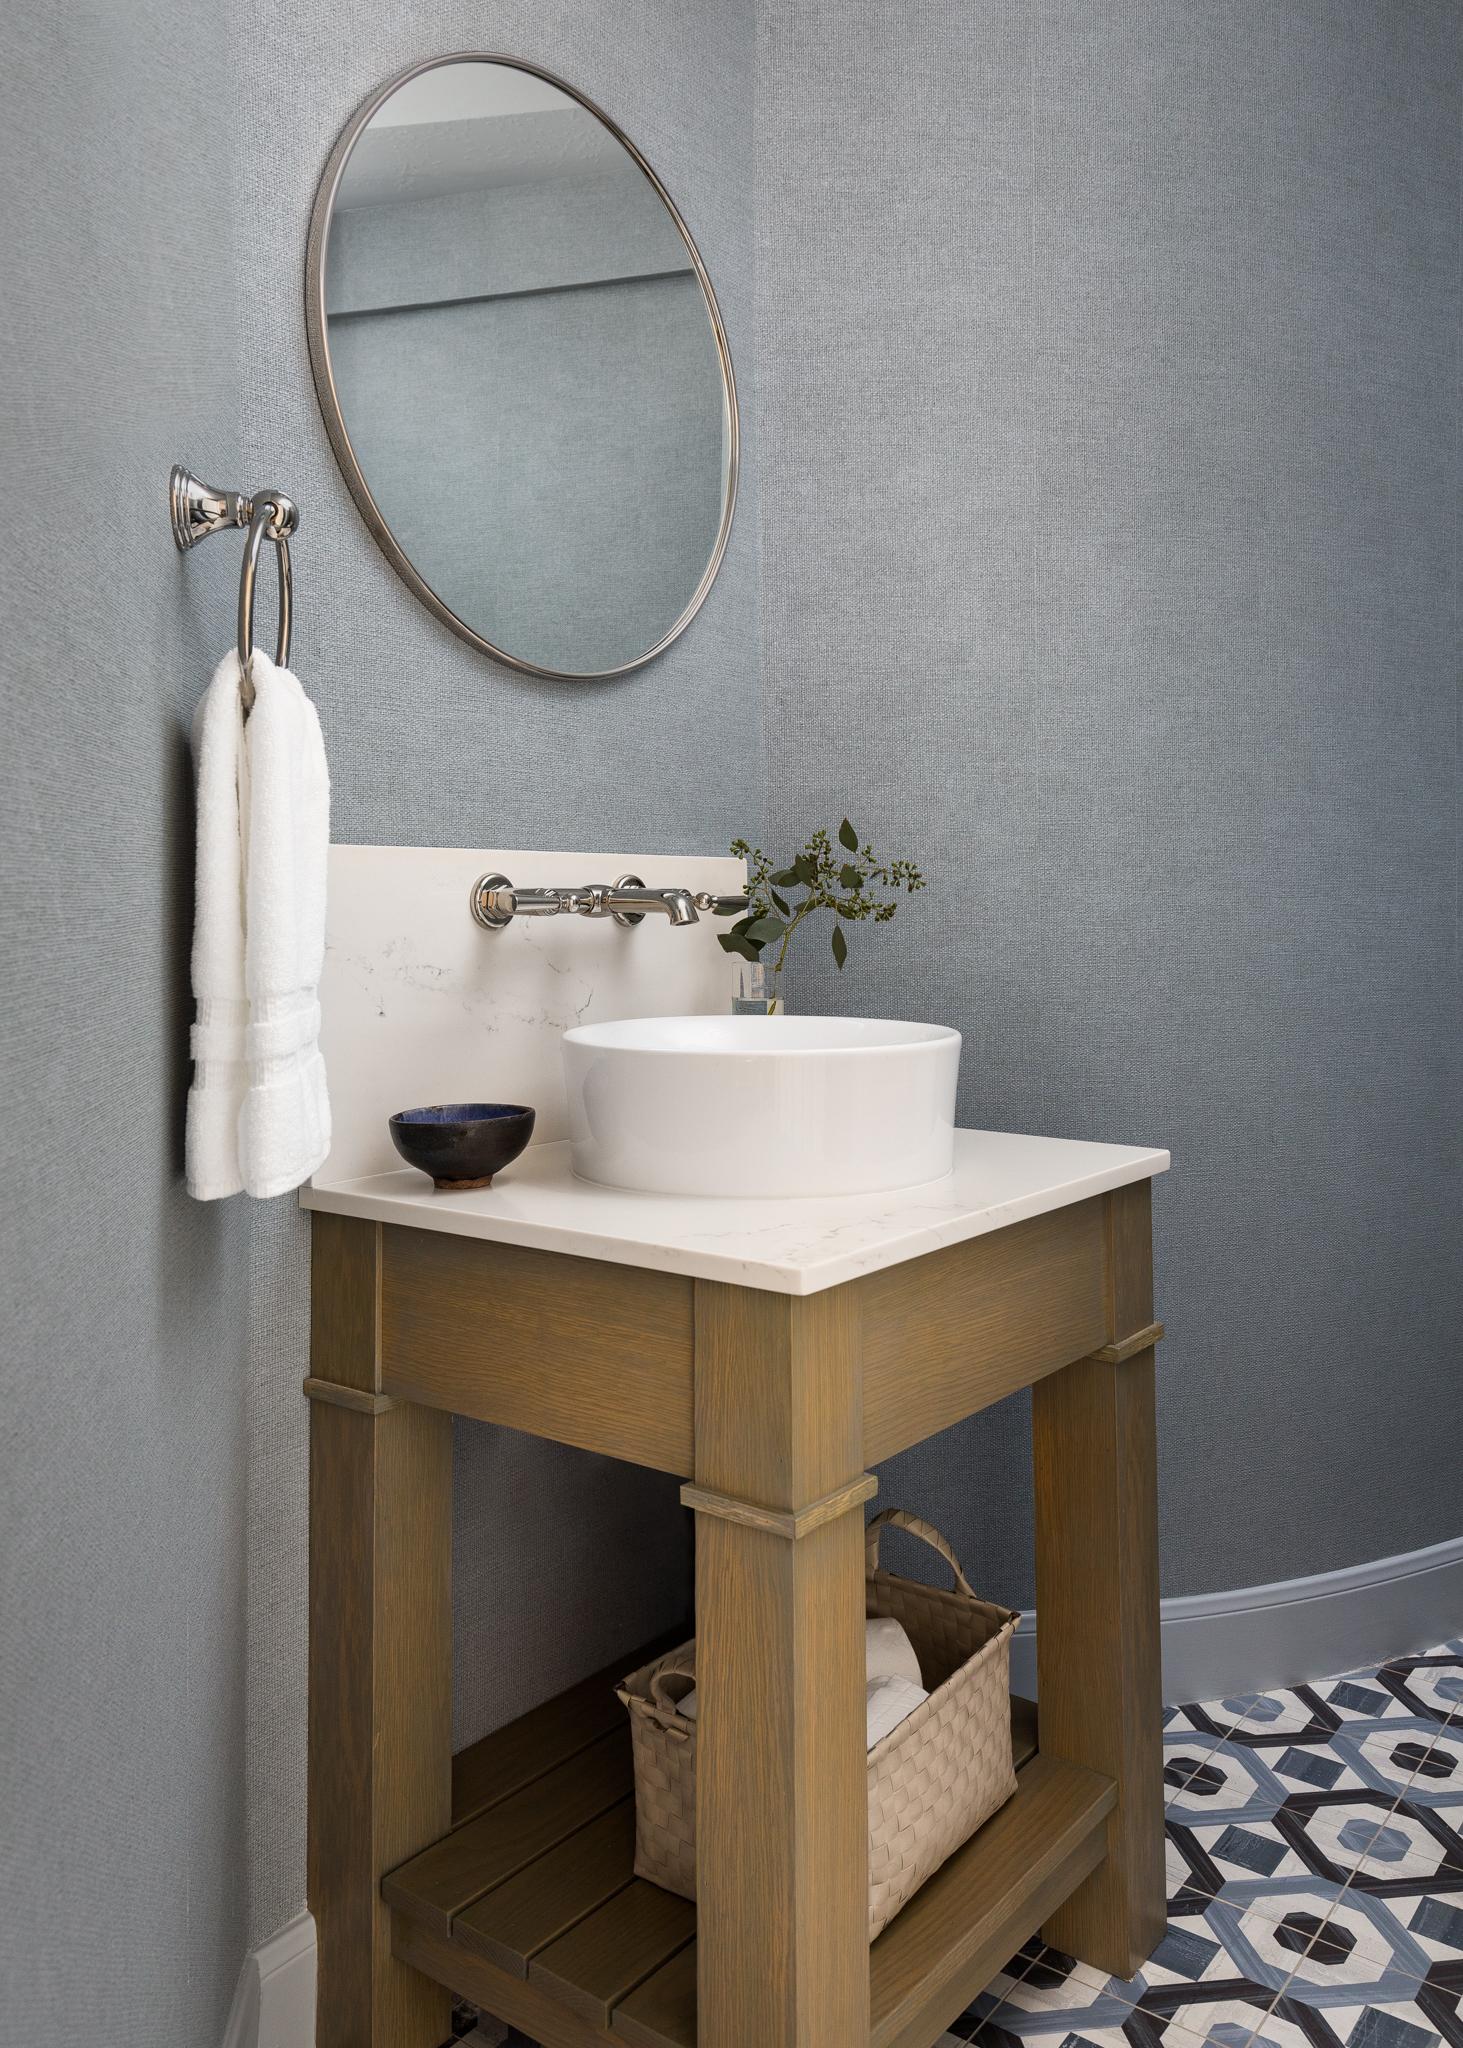 Family Friendly Powder Bath Remodel |Carla Aston, Designer | Colleen Scott, Photographer #powderbath #powderroom #cementtile #vesselsink